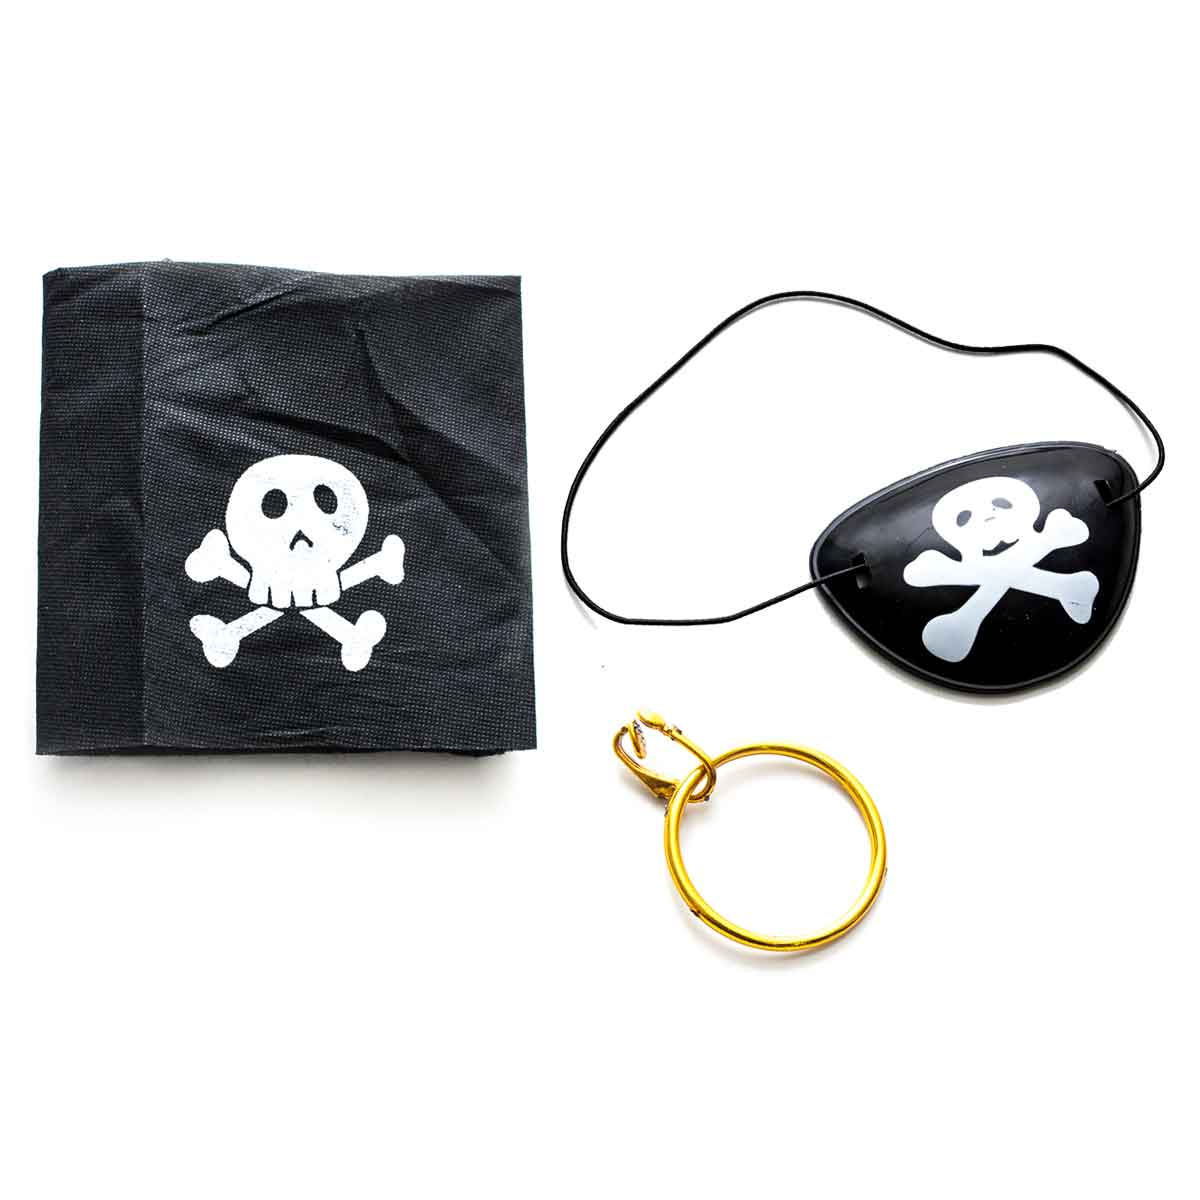 Kit Pirata 3 Peças Tapa Olho Lenço Brinco Fantasia Festa